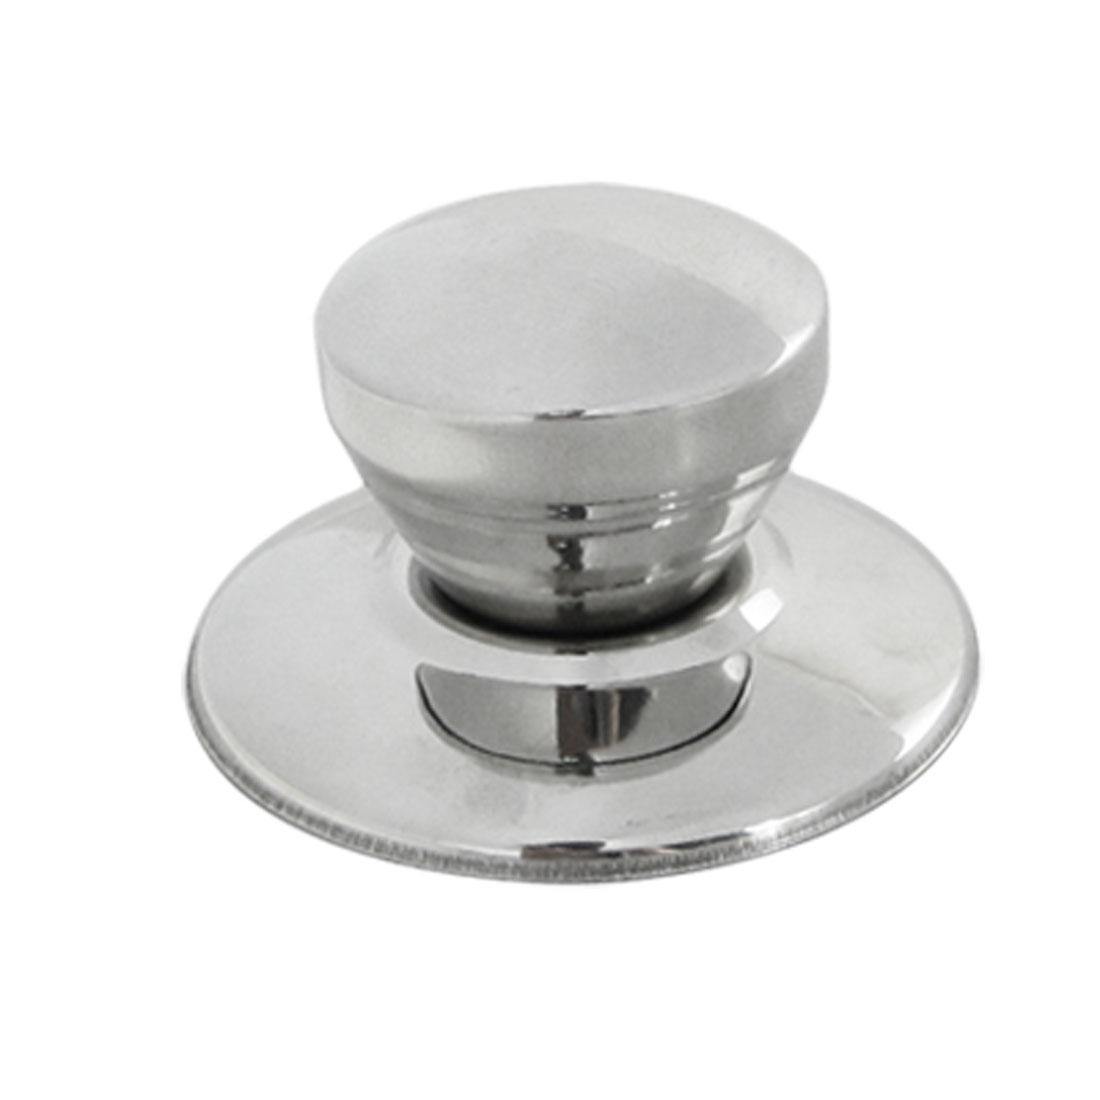 Silver Tone Replacement Cookware Pot Pan Lid Knob